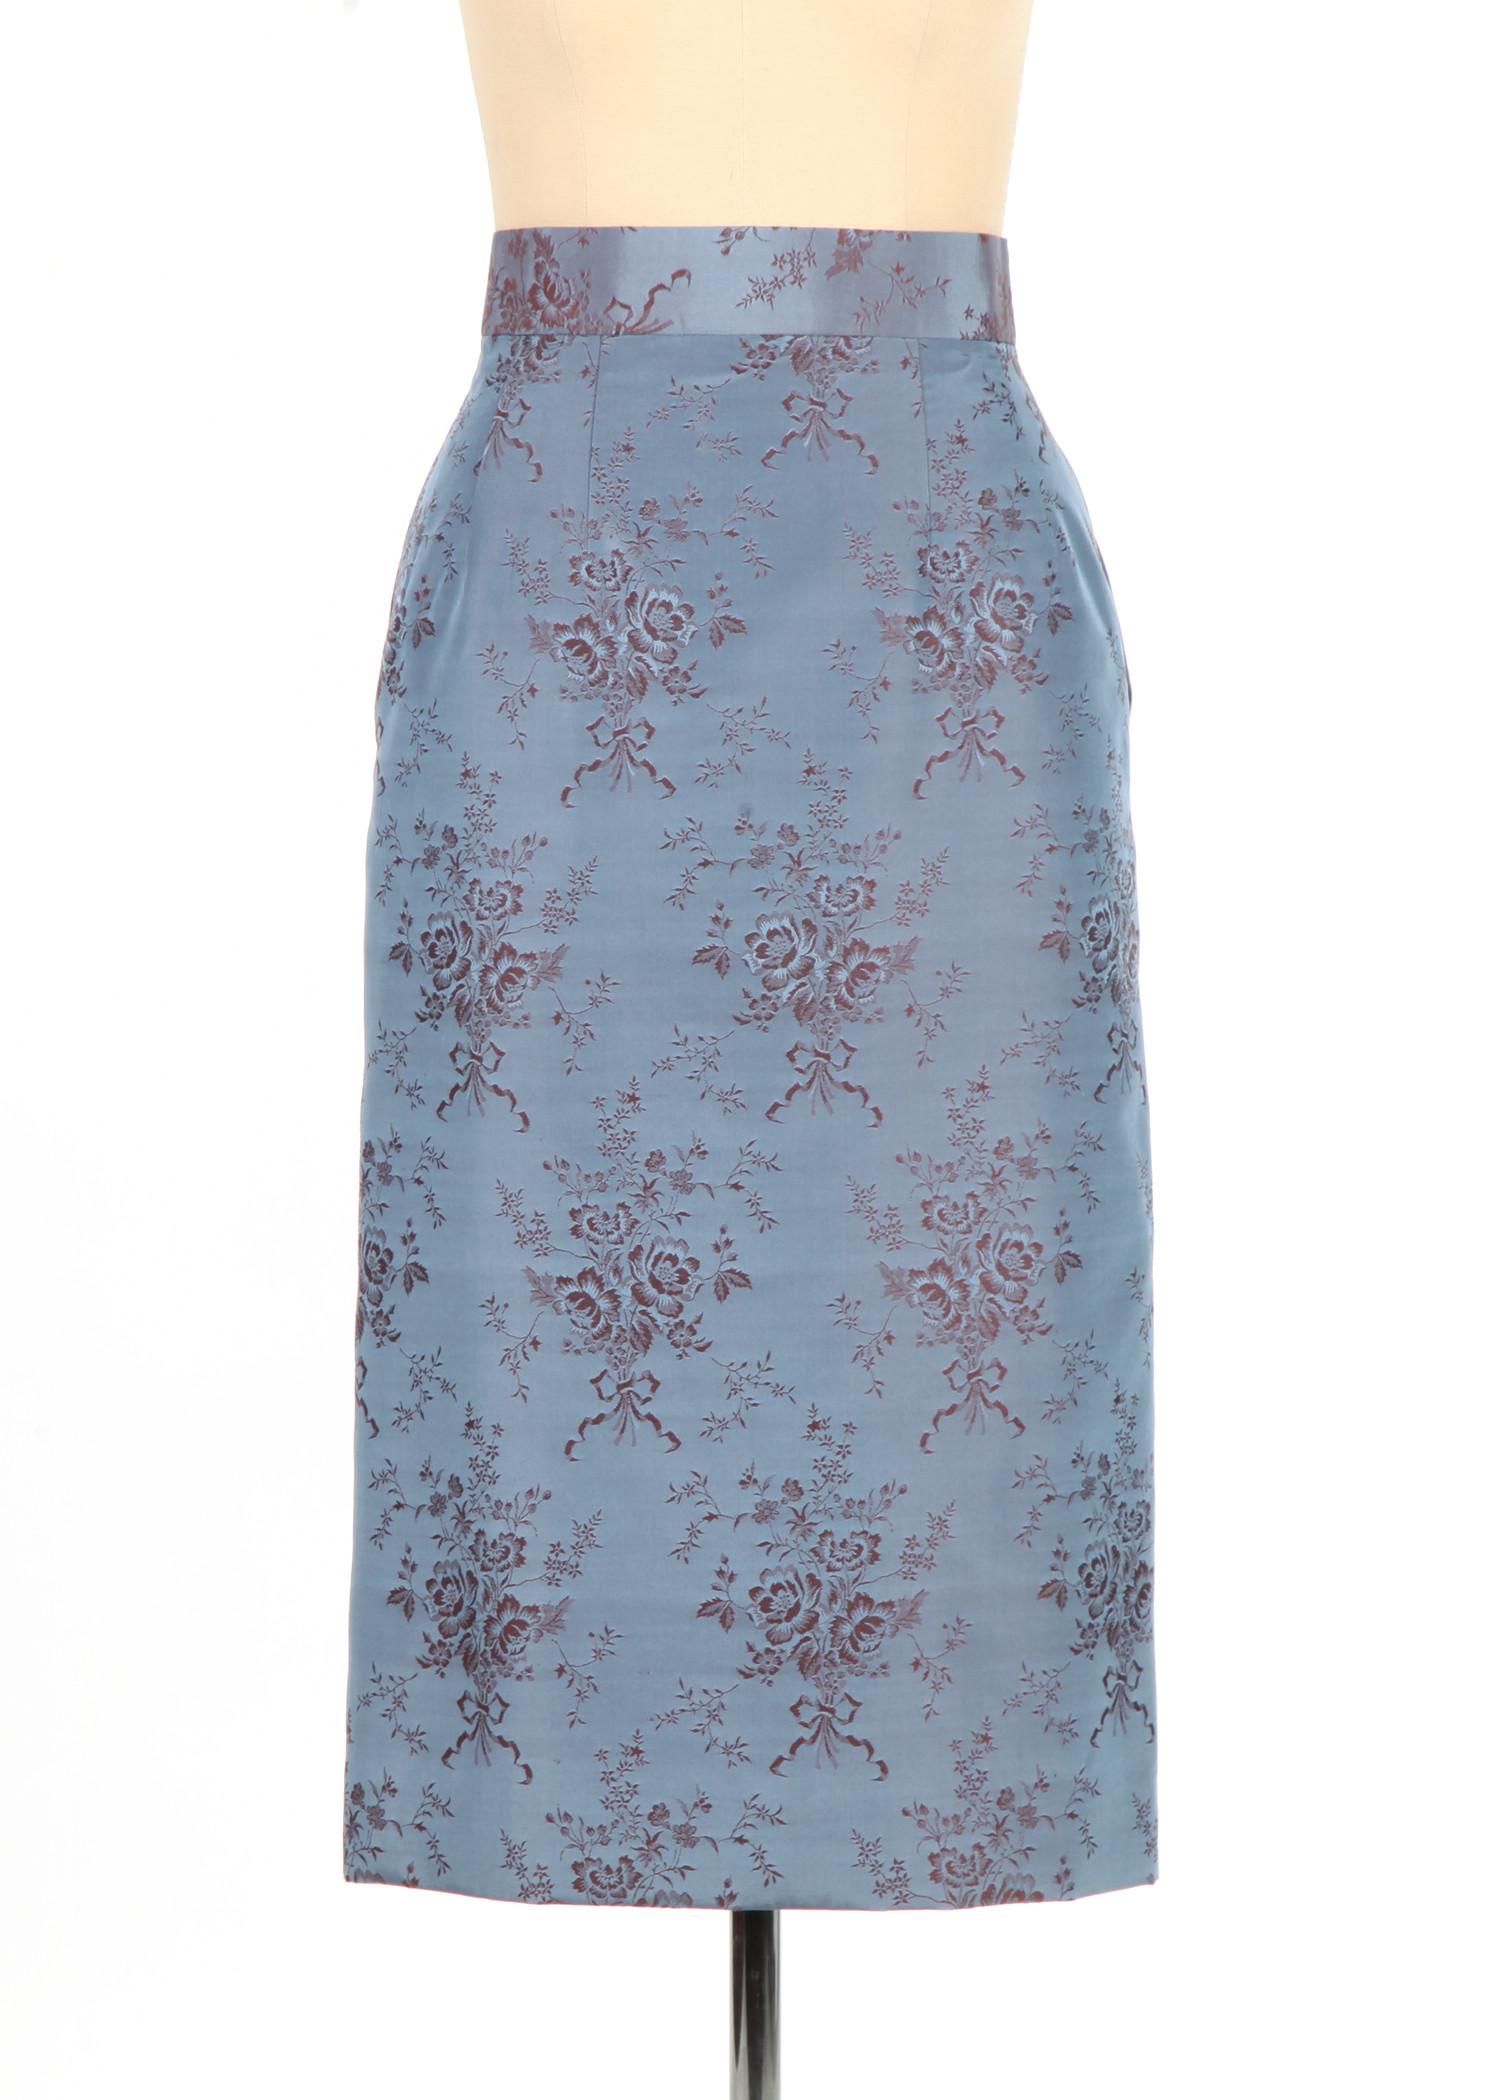 Midi skirt with high quality silk fabric